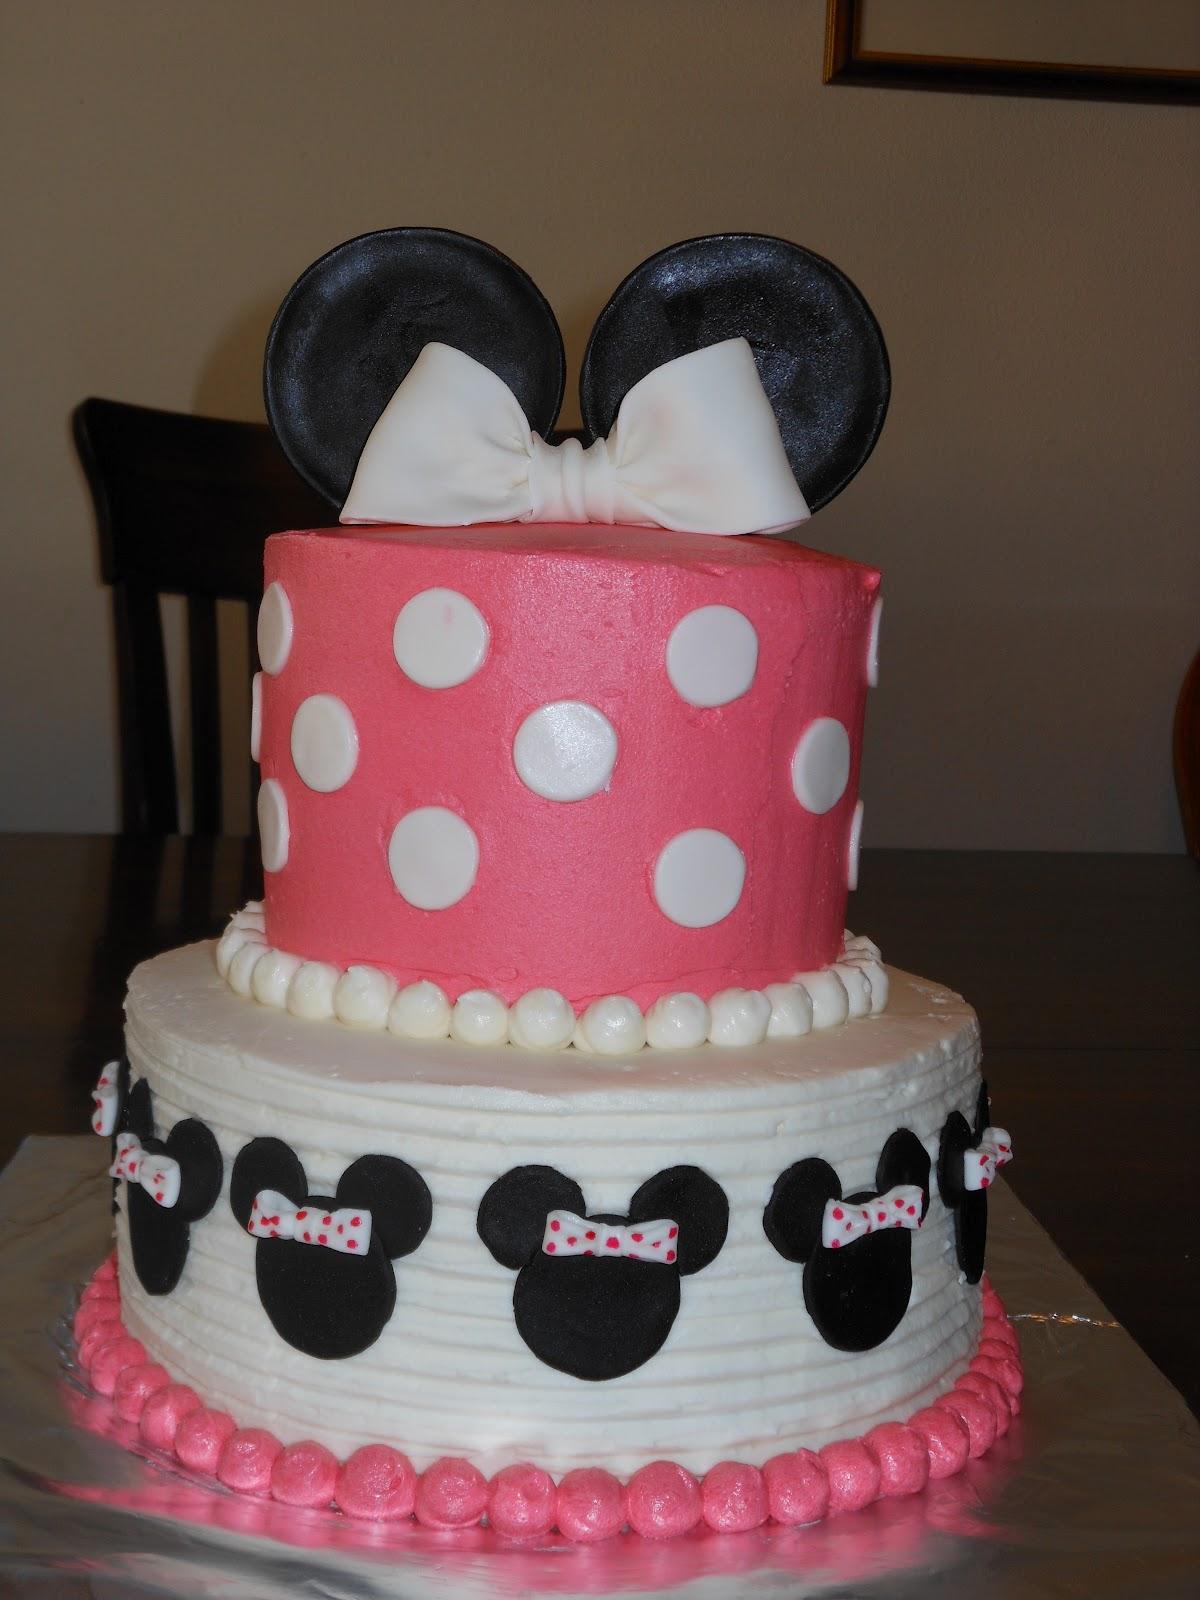 Minnie Birthday Cake Image Inspiration of Cake and Birthday